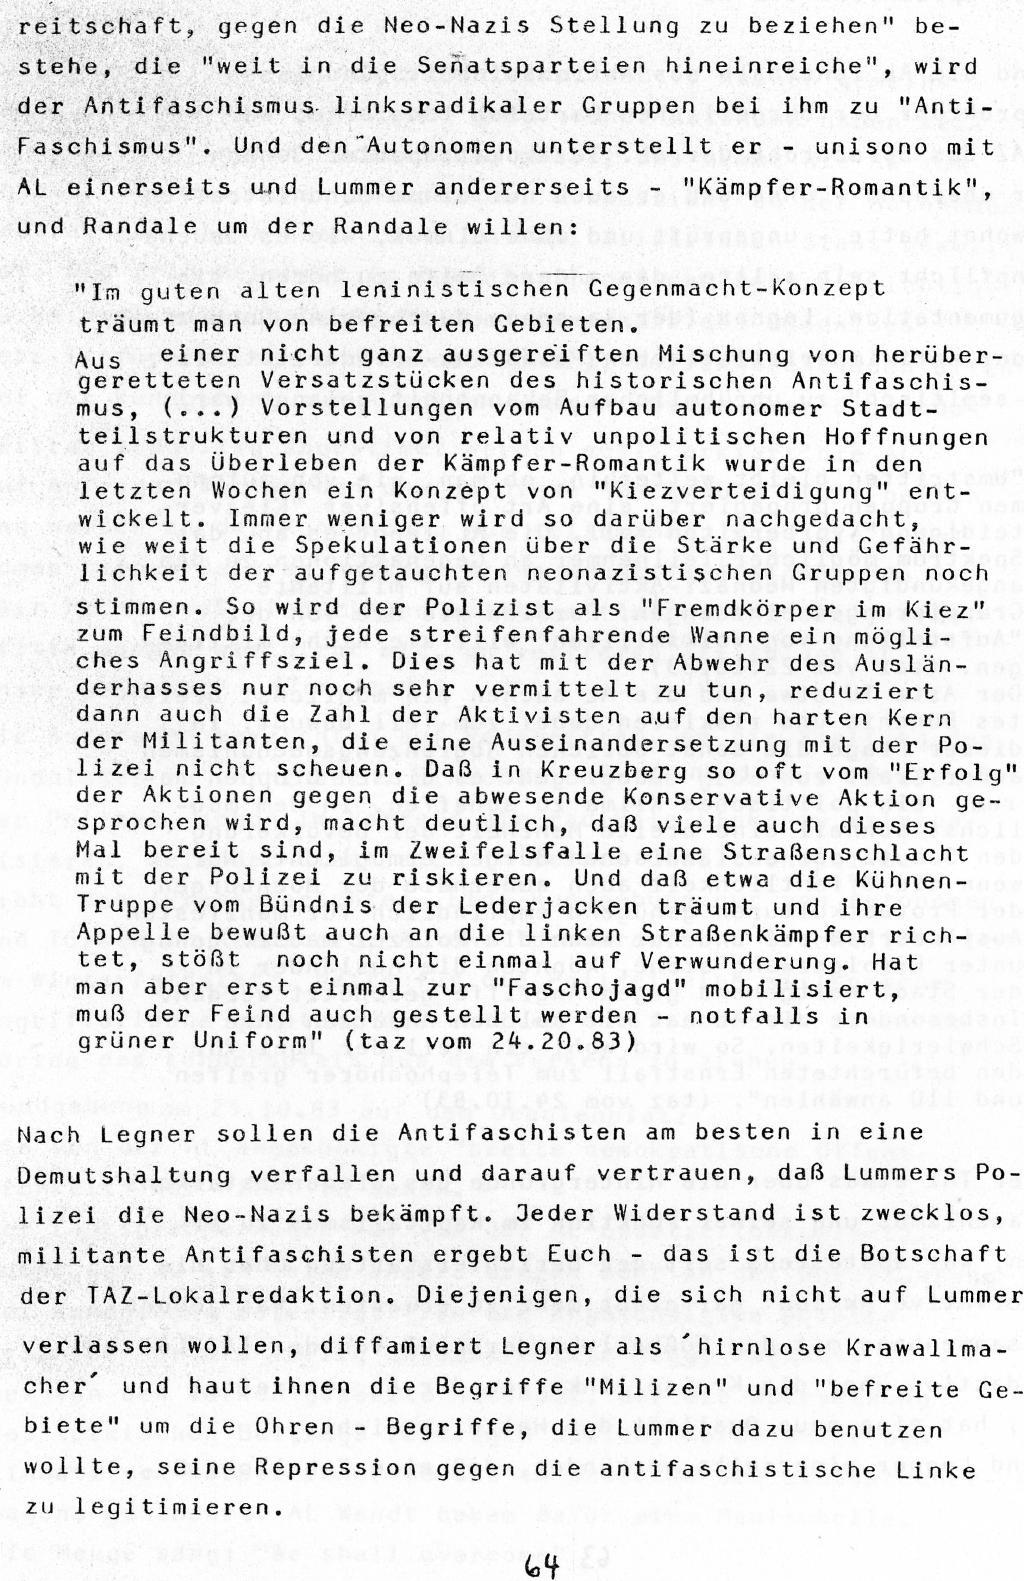 Berlin_1983_Autonome_Gruppen_Faschismus_im_Kapitalismus_64